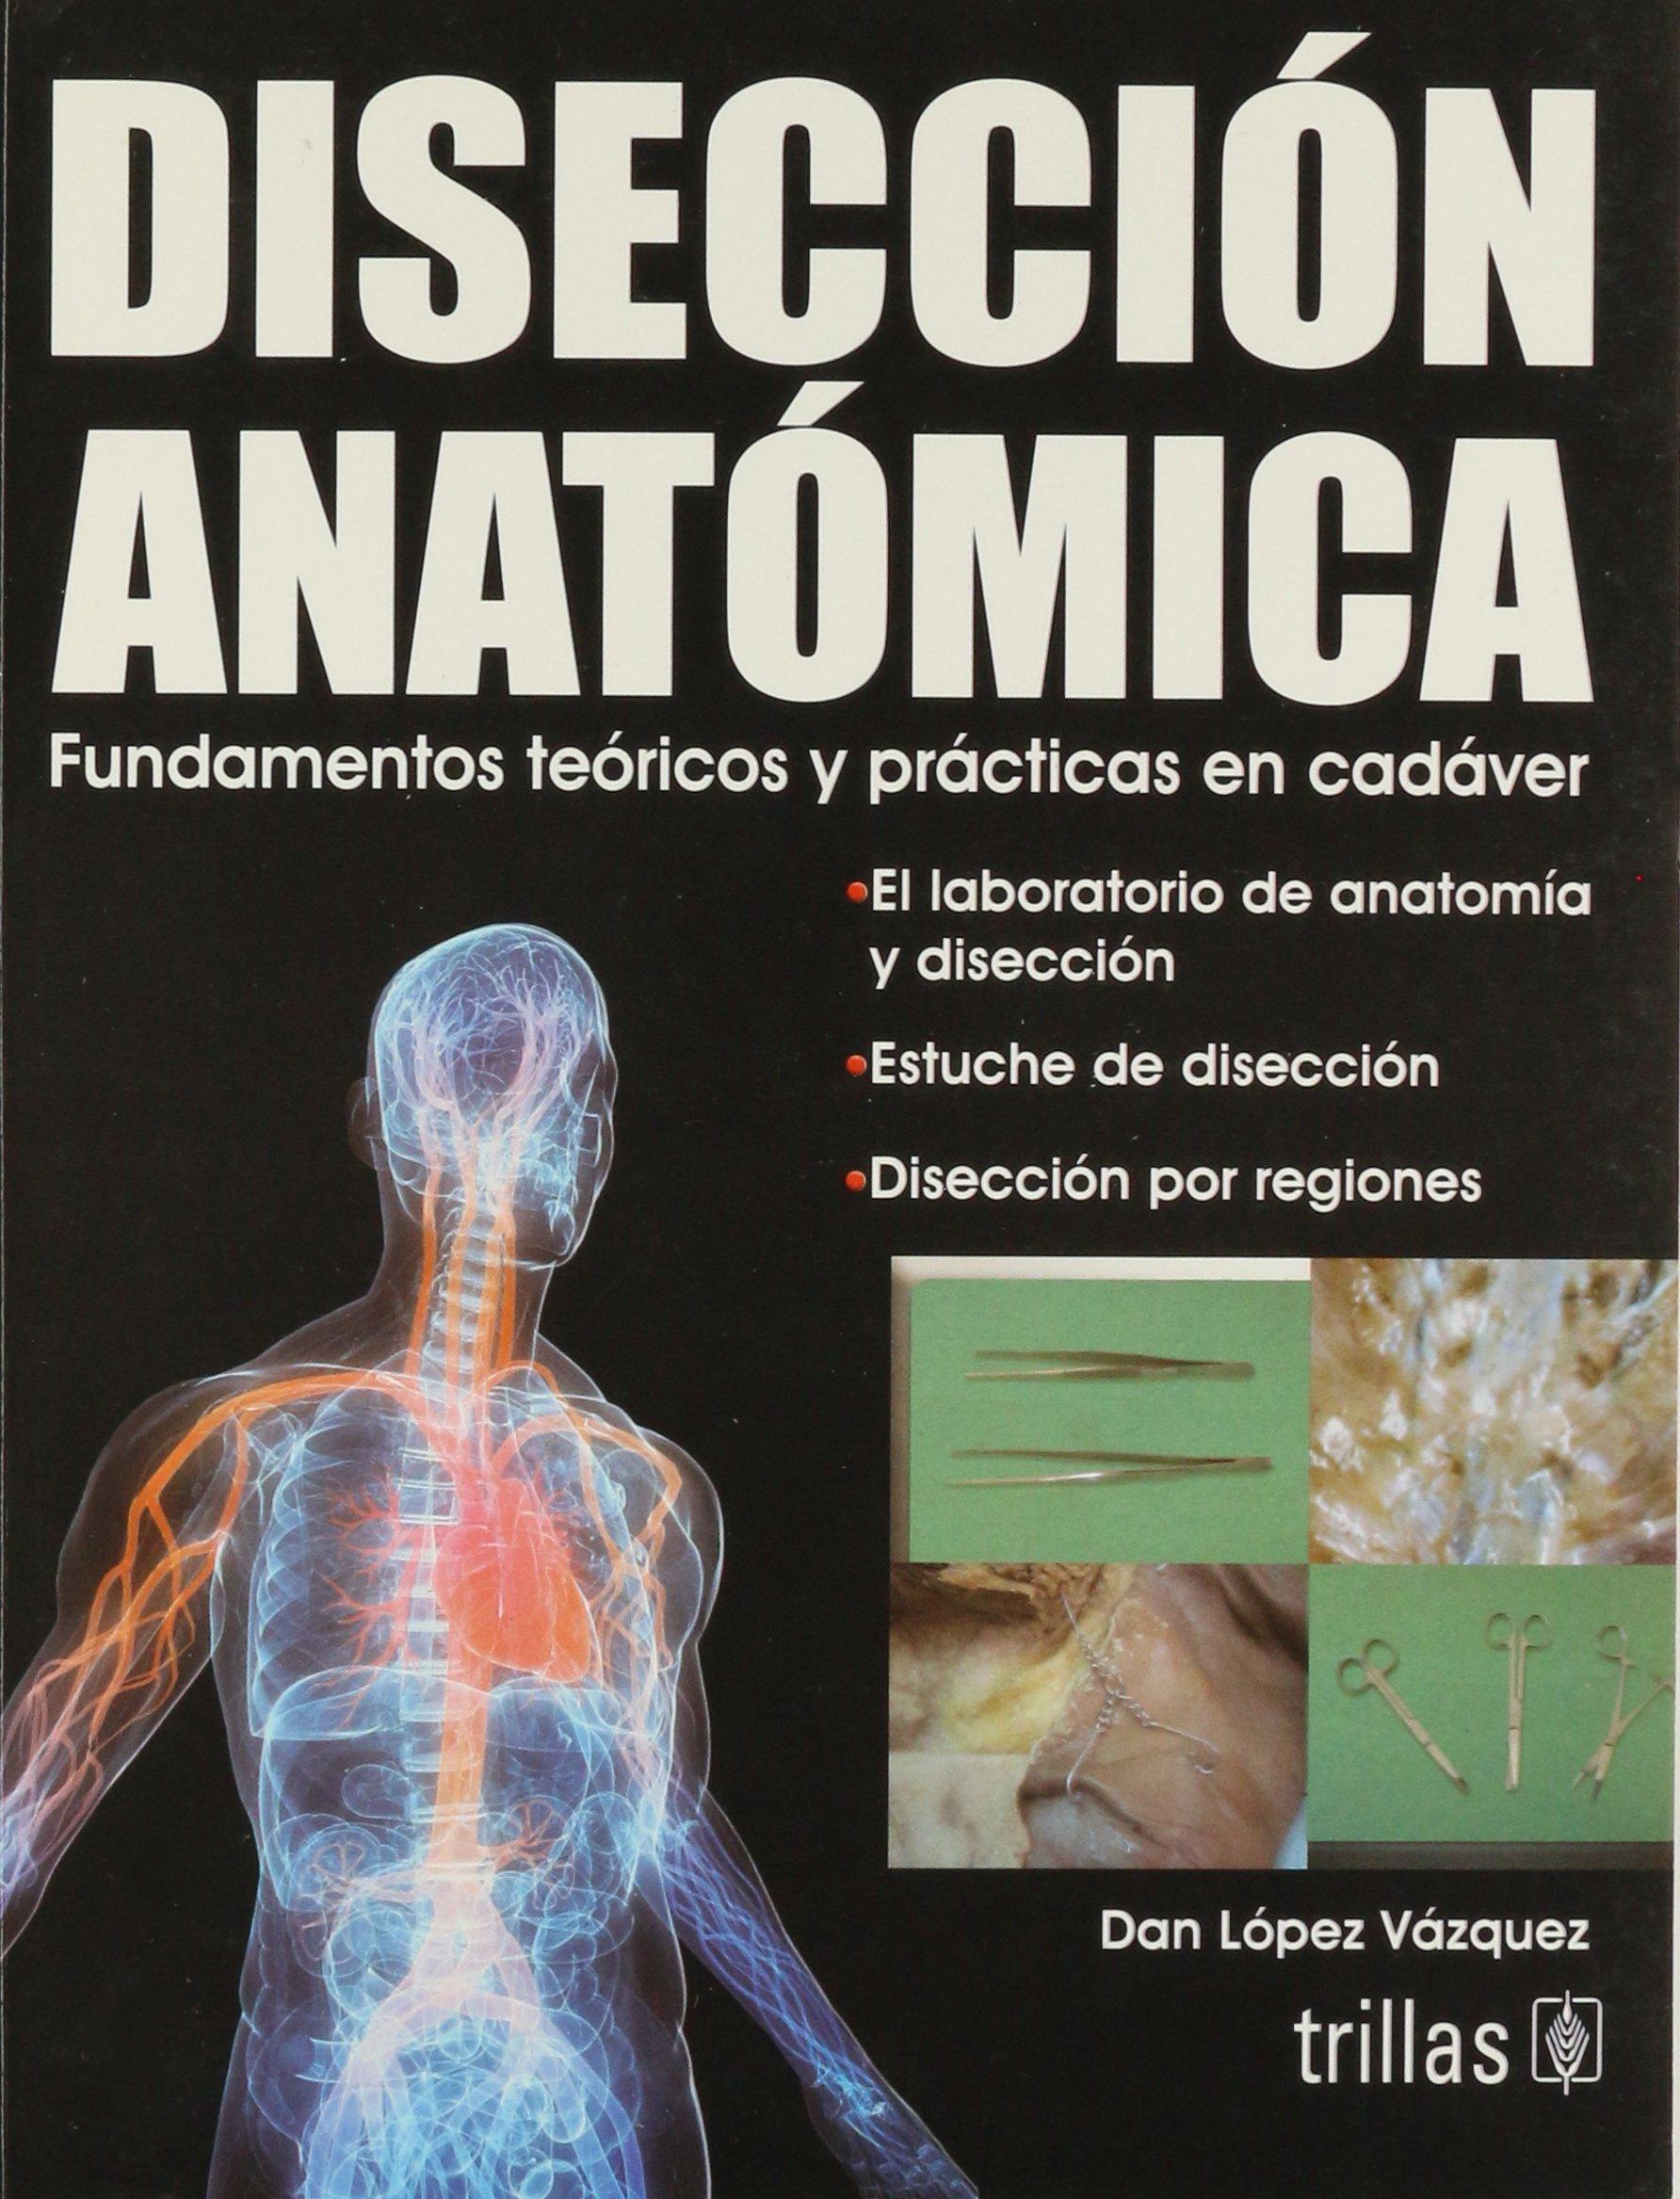 Diseccion anatomica / Anatomical dissection: Amazon.es: Vazquez, Dan Lopez: Libros